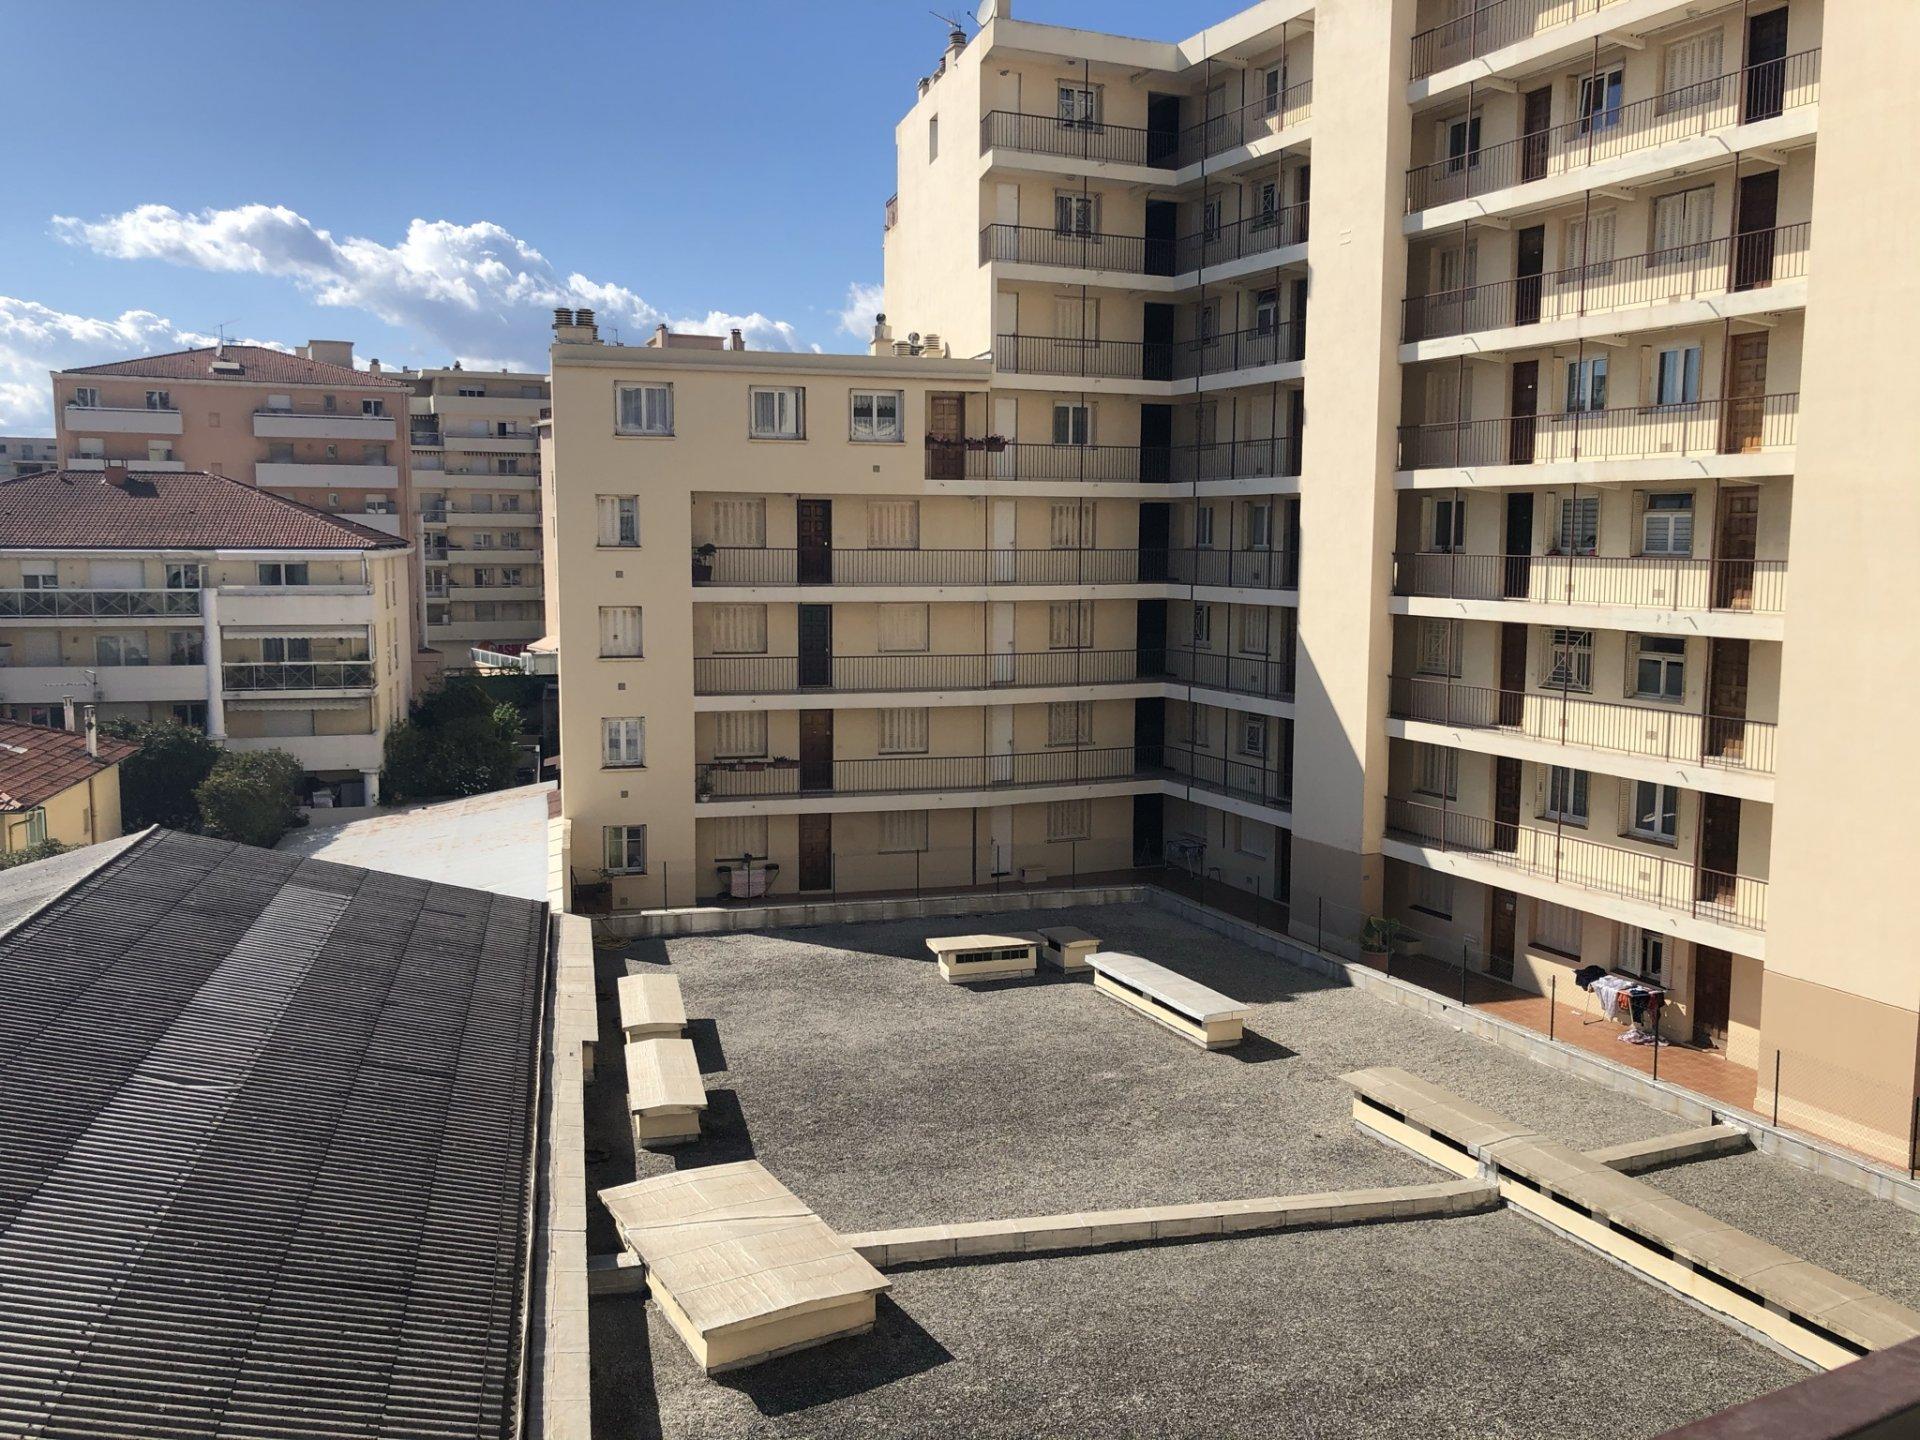 Affitto Appartamento - Nizza (Nice) Saint Roch